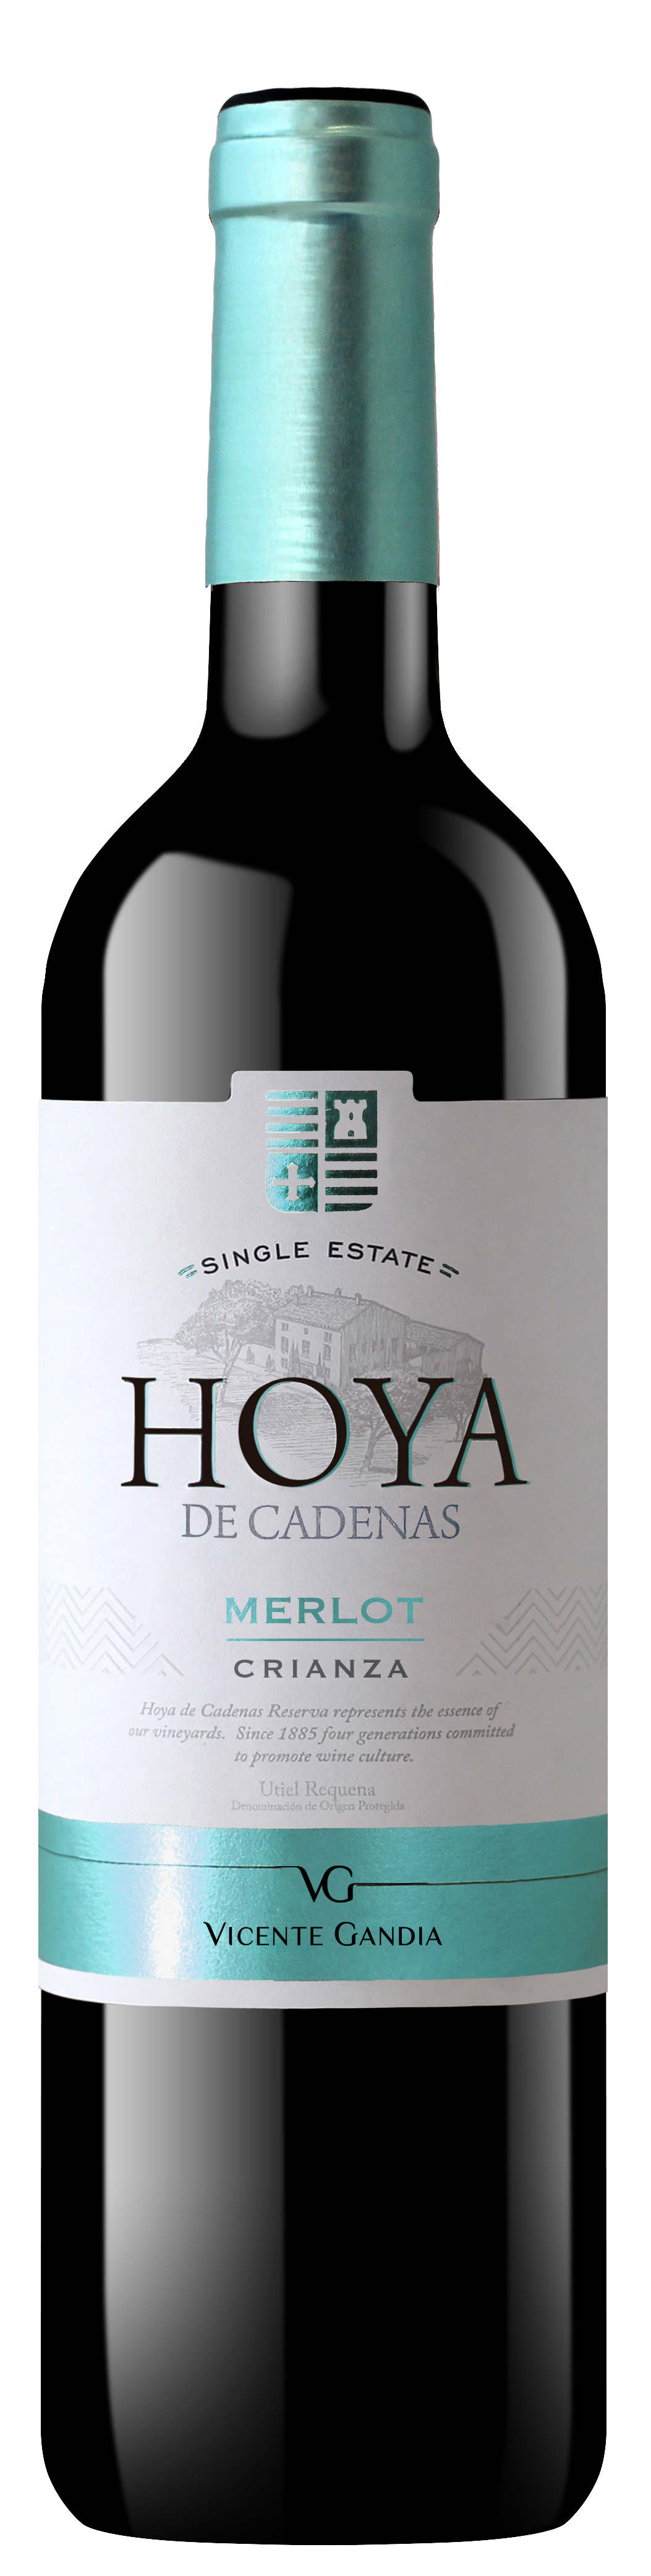 Hoya de Cadenas Merlot Crianza